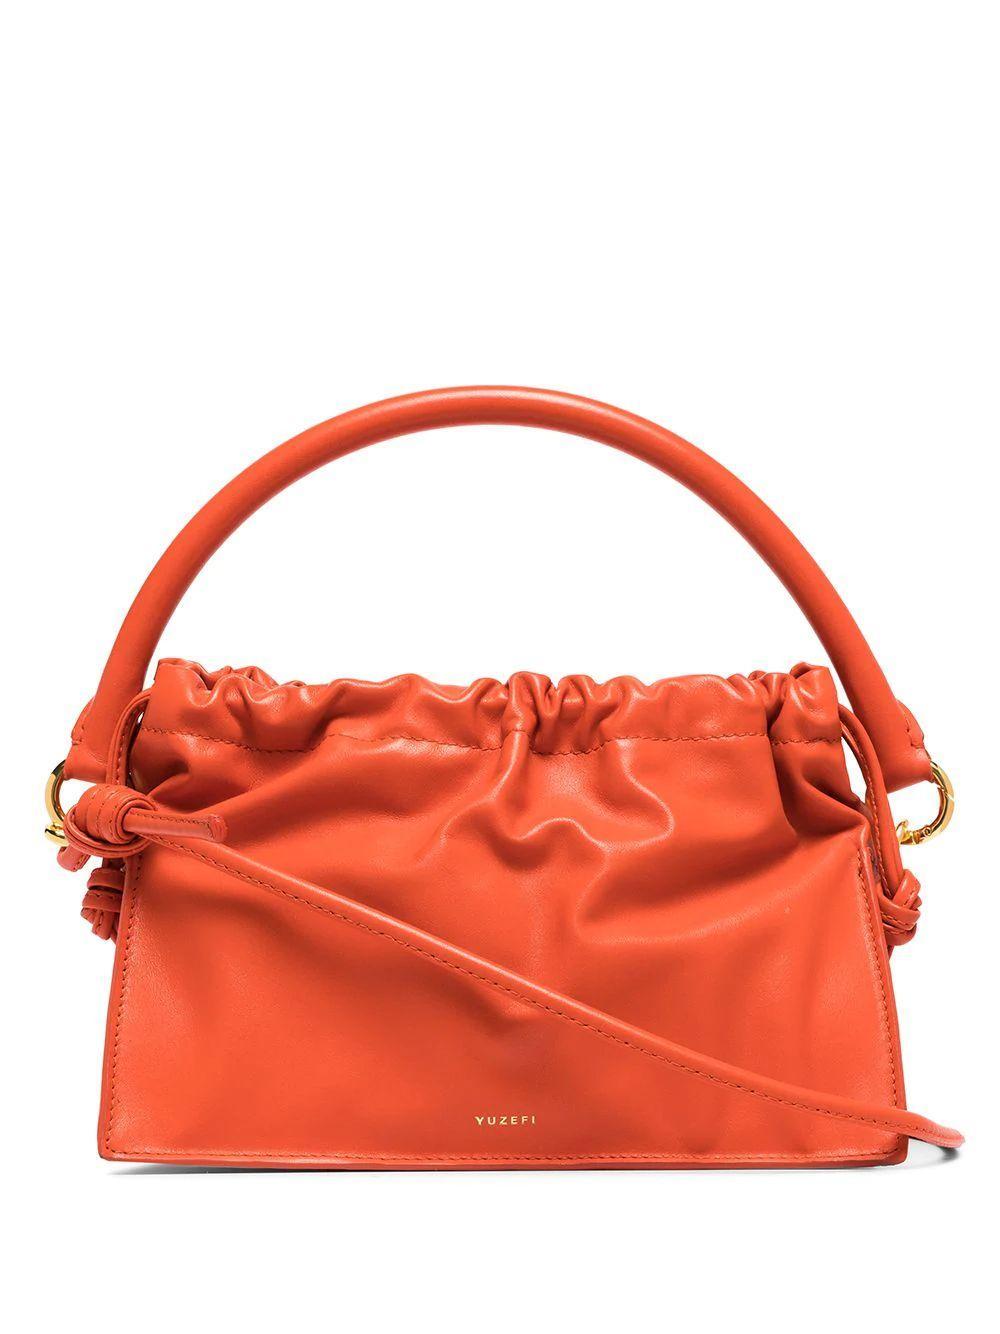 Bom Shoulder Bag Item # YUZSS20-BO-03